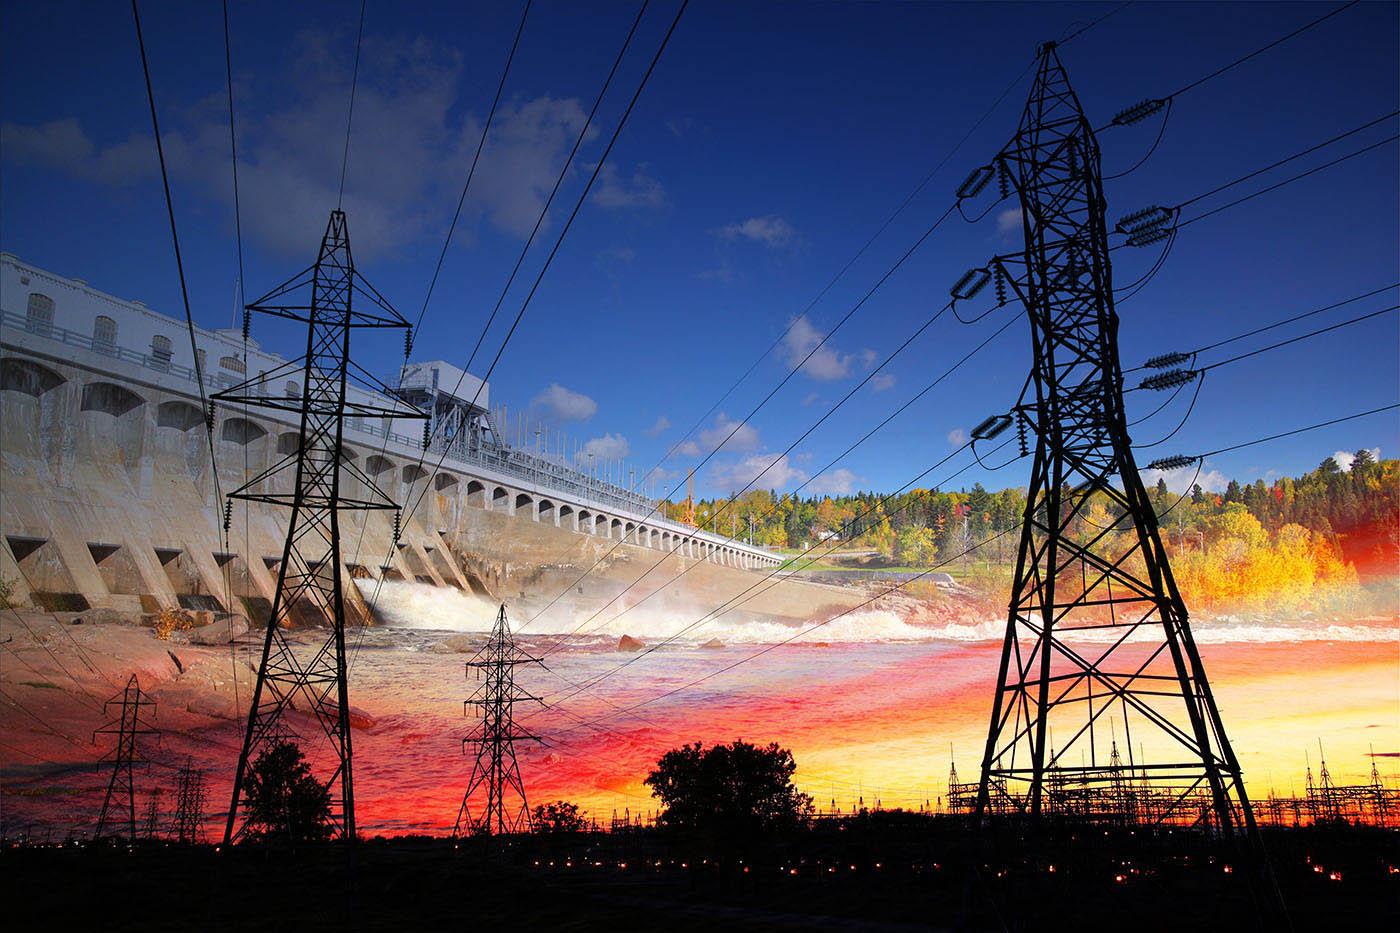 Electric Dam 02 - Stock Photo